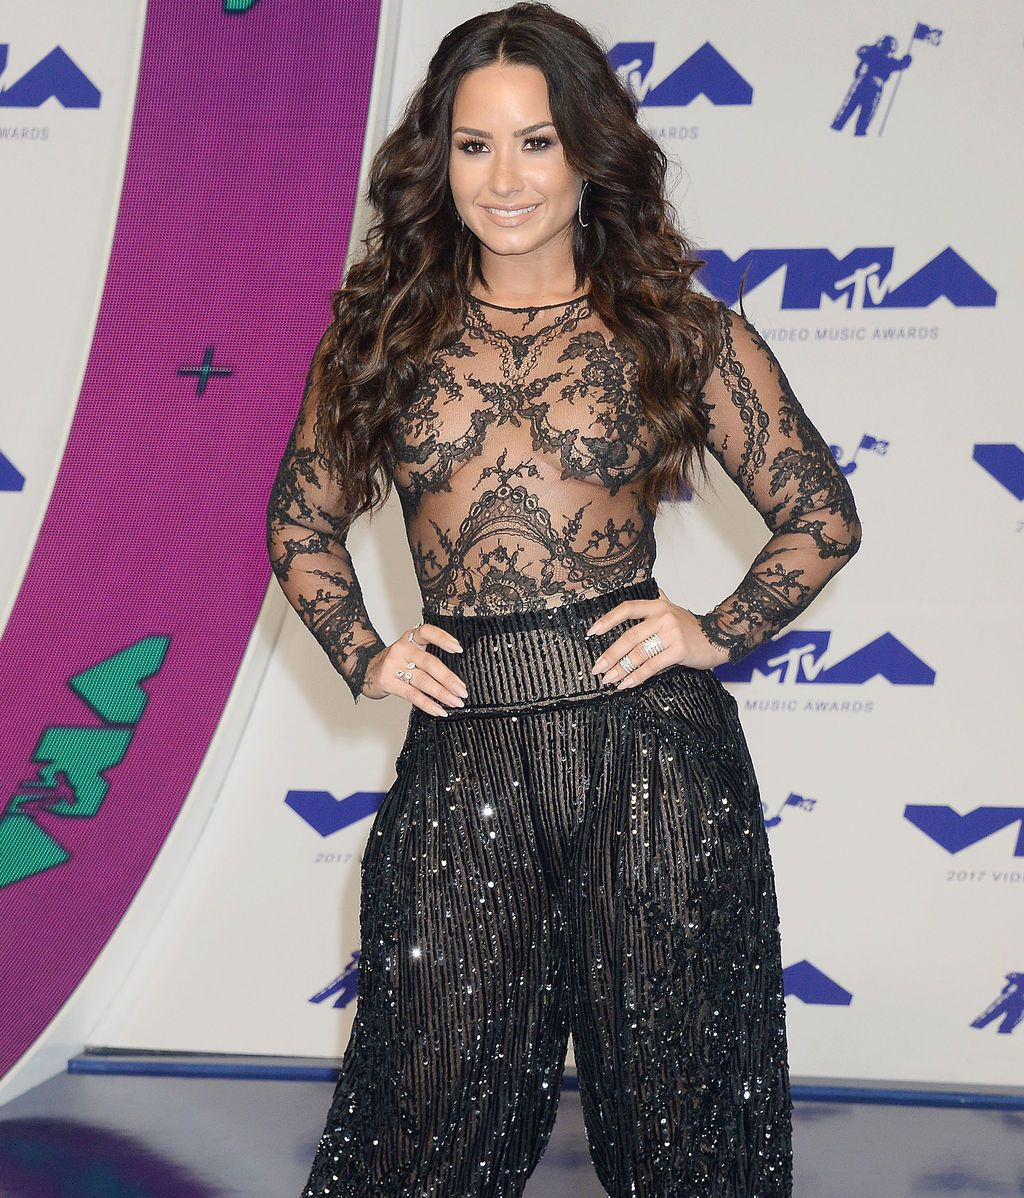 Demi Lovato apostó por un 'total black' con transparencias y pedrería de Zuhair Murad